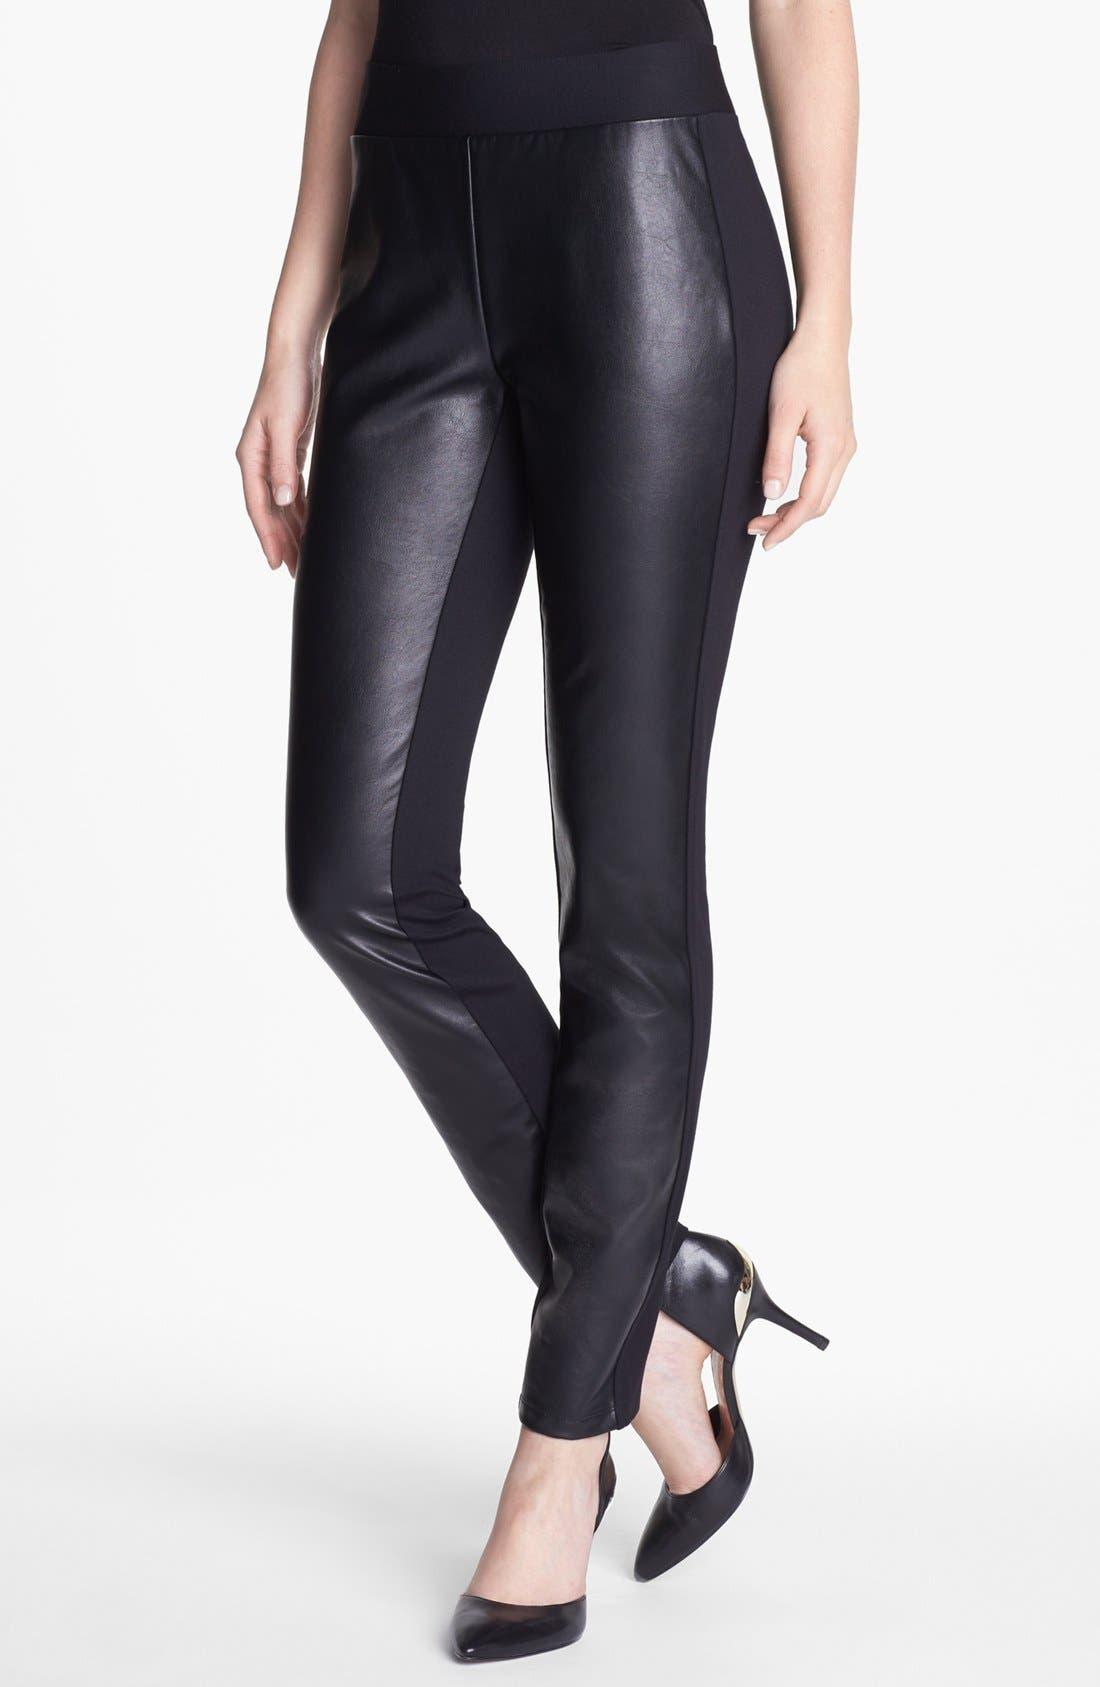 Main Image - NYDJ Faux Leather & Stretch Ponte Leggings (Regular & Petite)